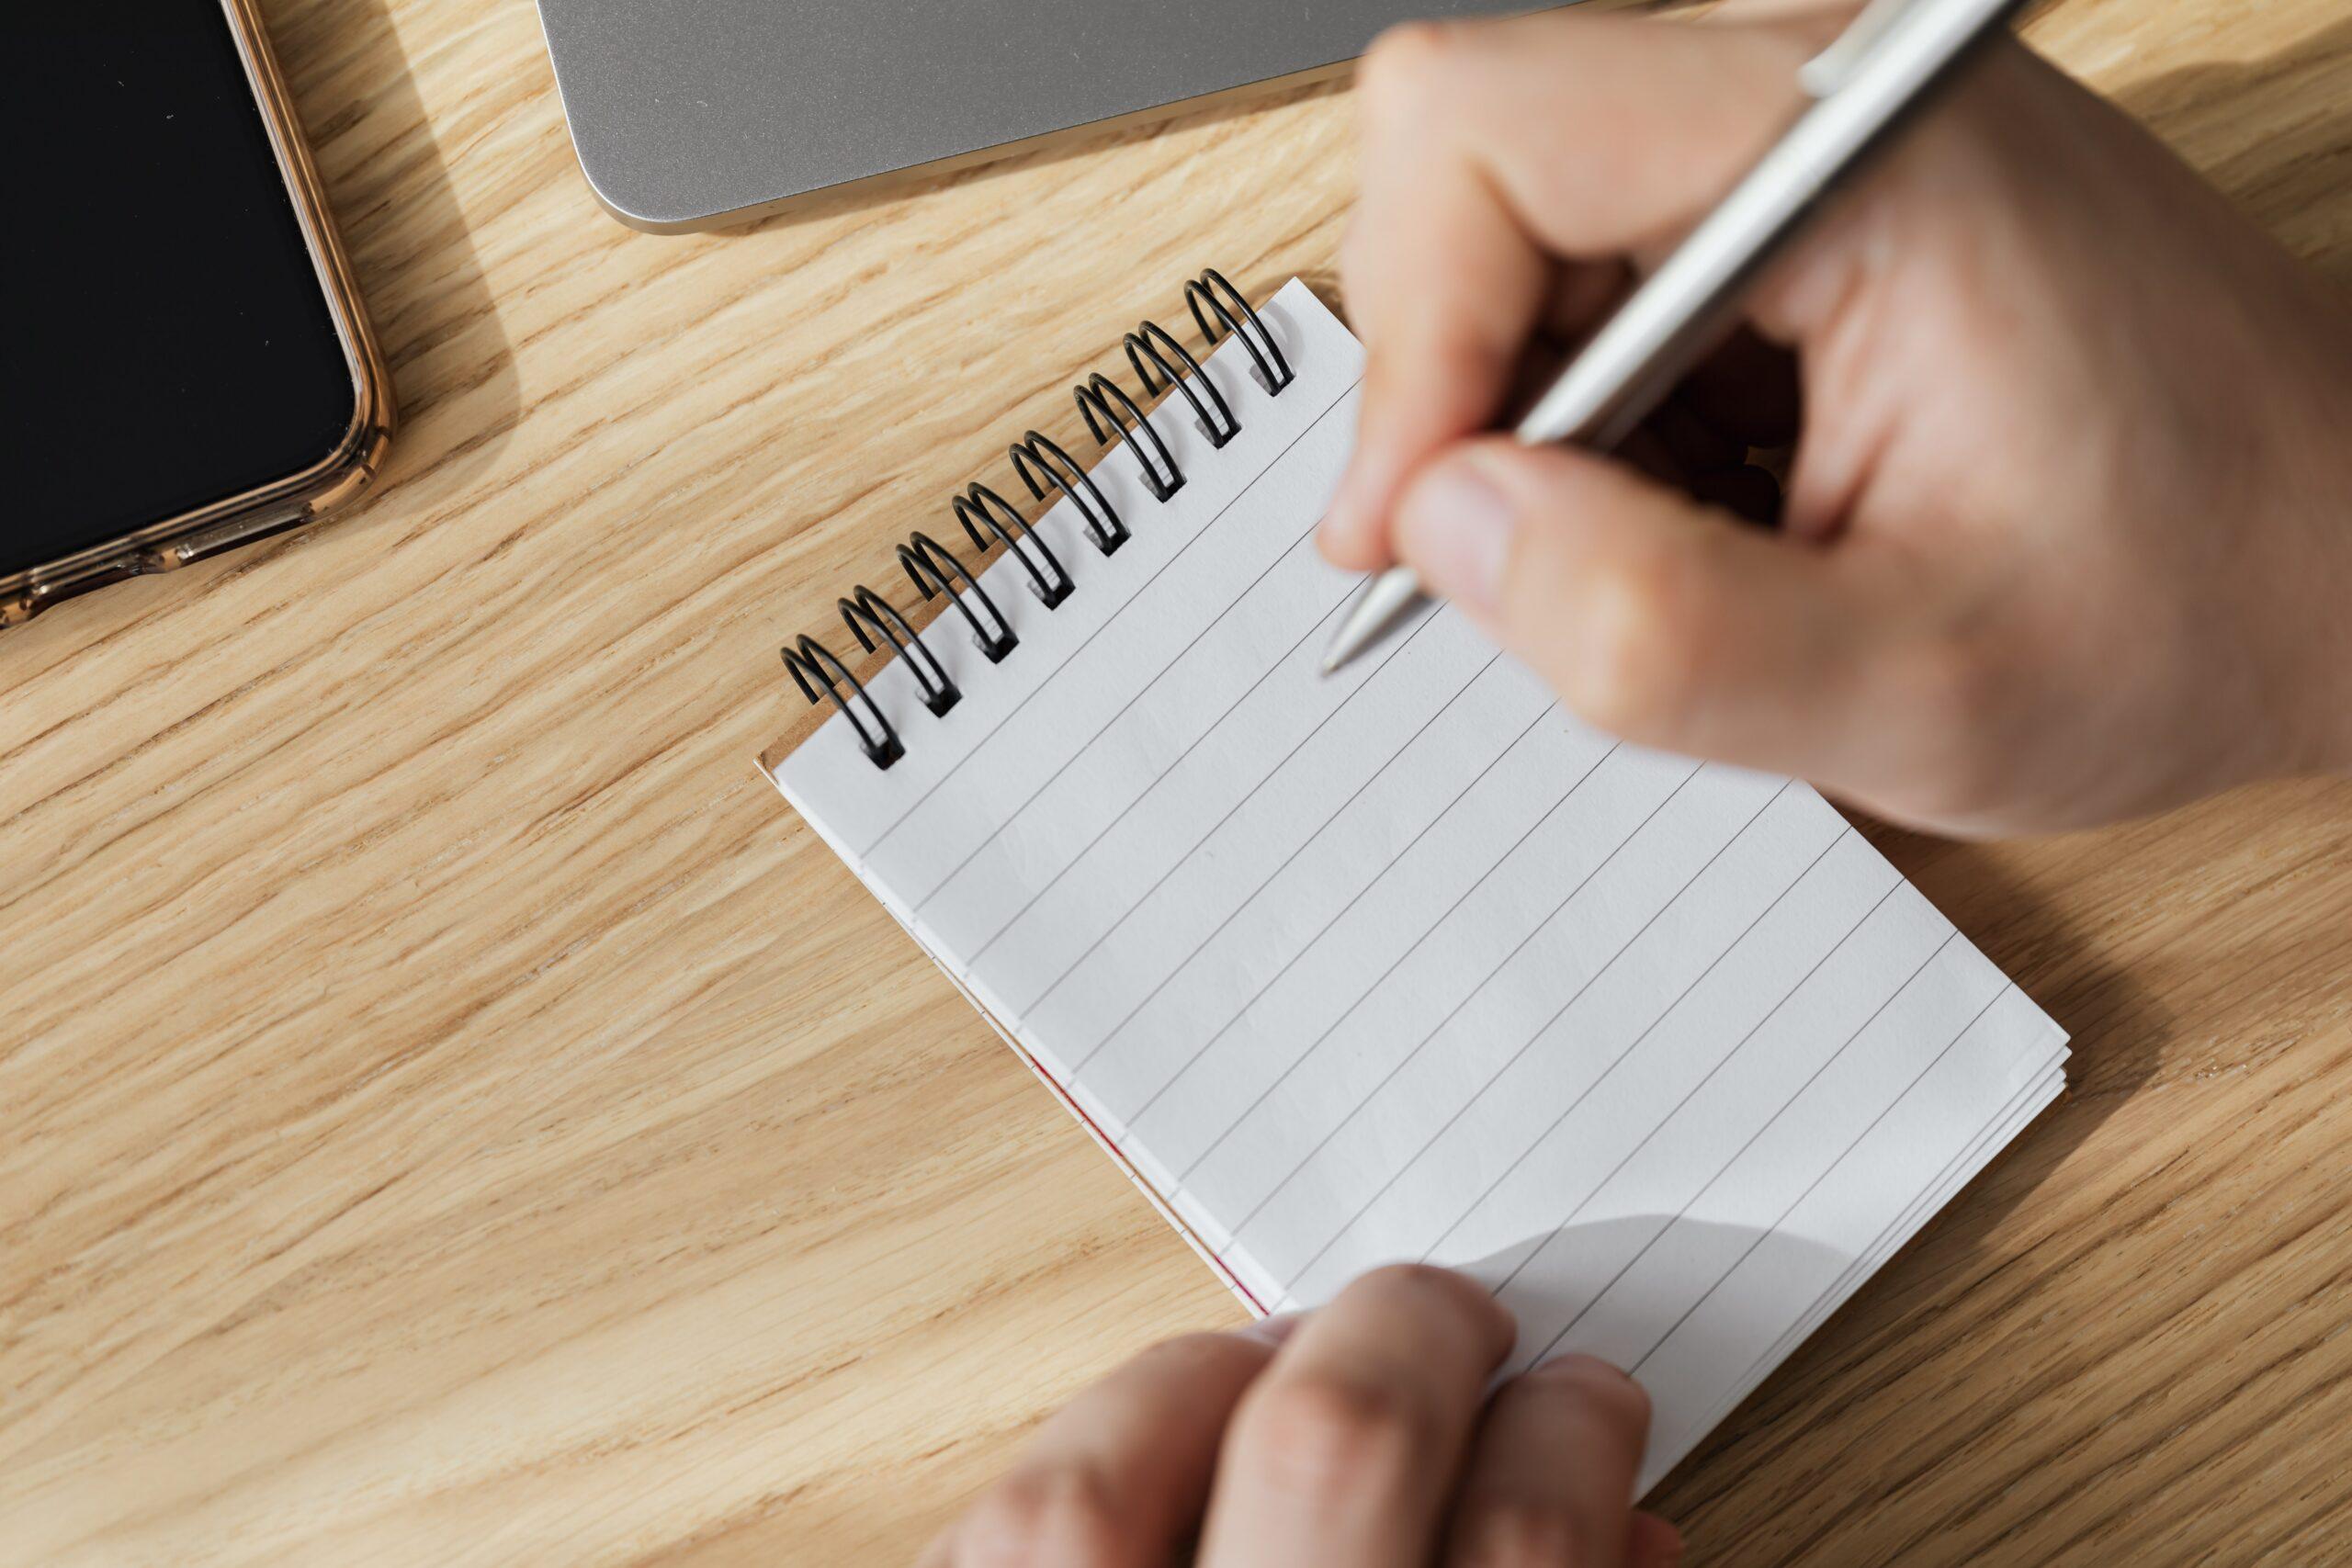 Writing on pad-pexels